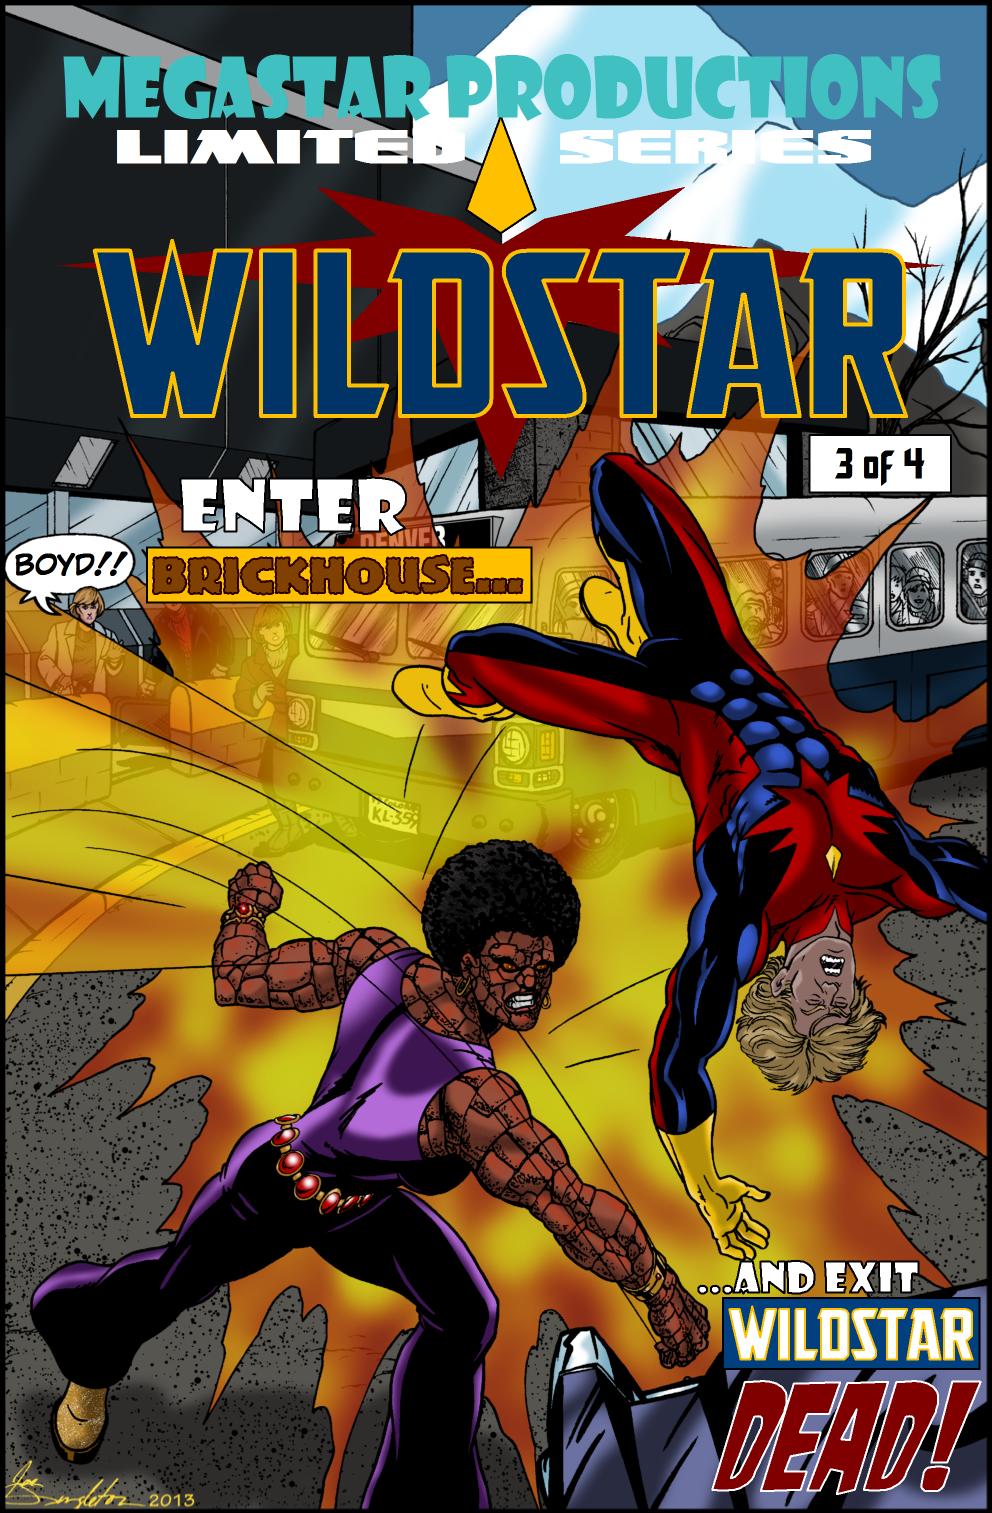 Wildstar Limited Series No 3 by Joe-Singleton